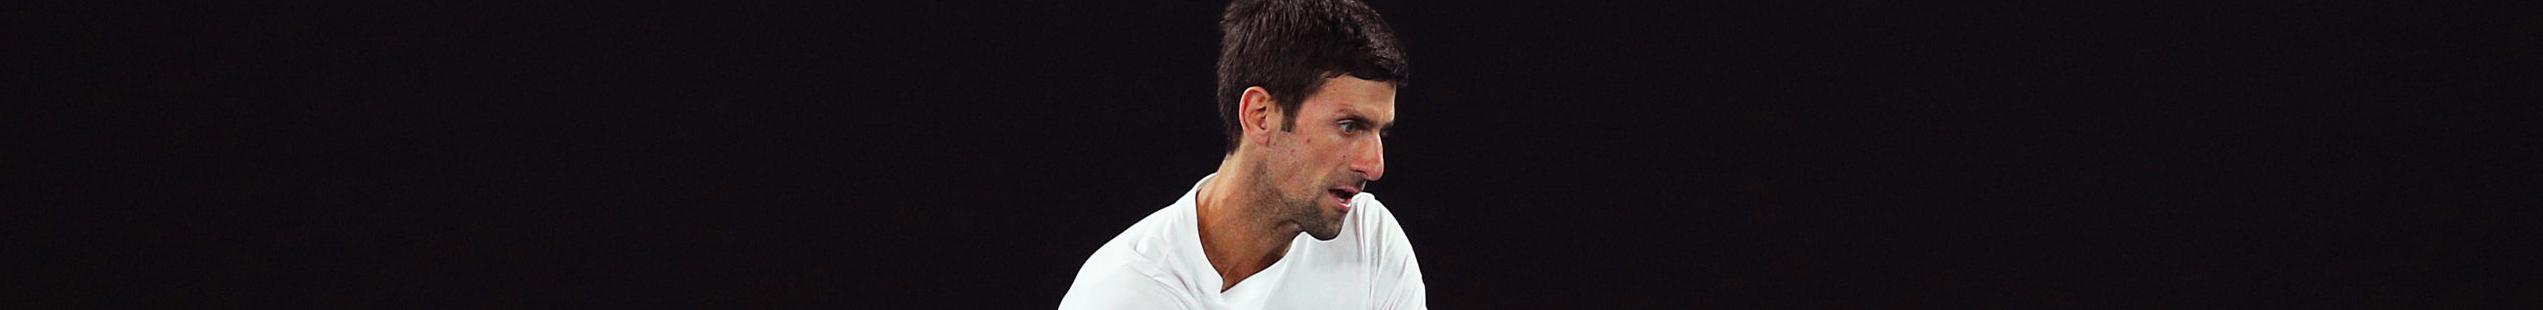 Australian Open 2020: Djokovic favorito su Nadal, poi Tsitsipas e Federer. Buio Italia tra le donne